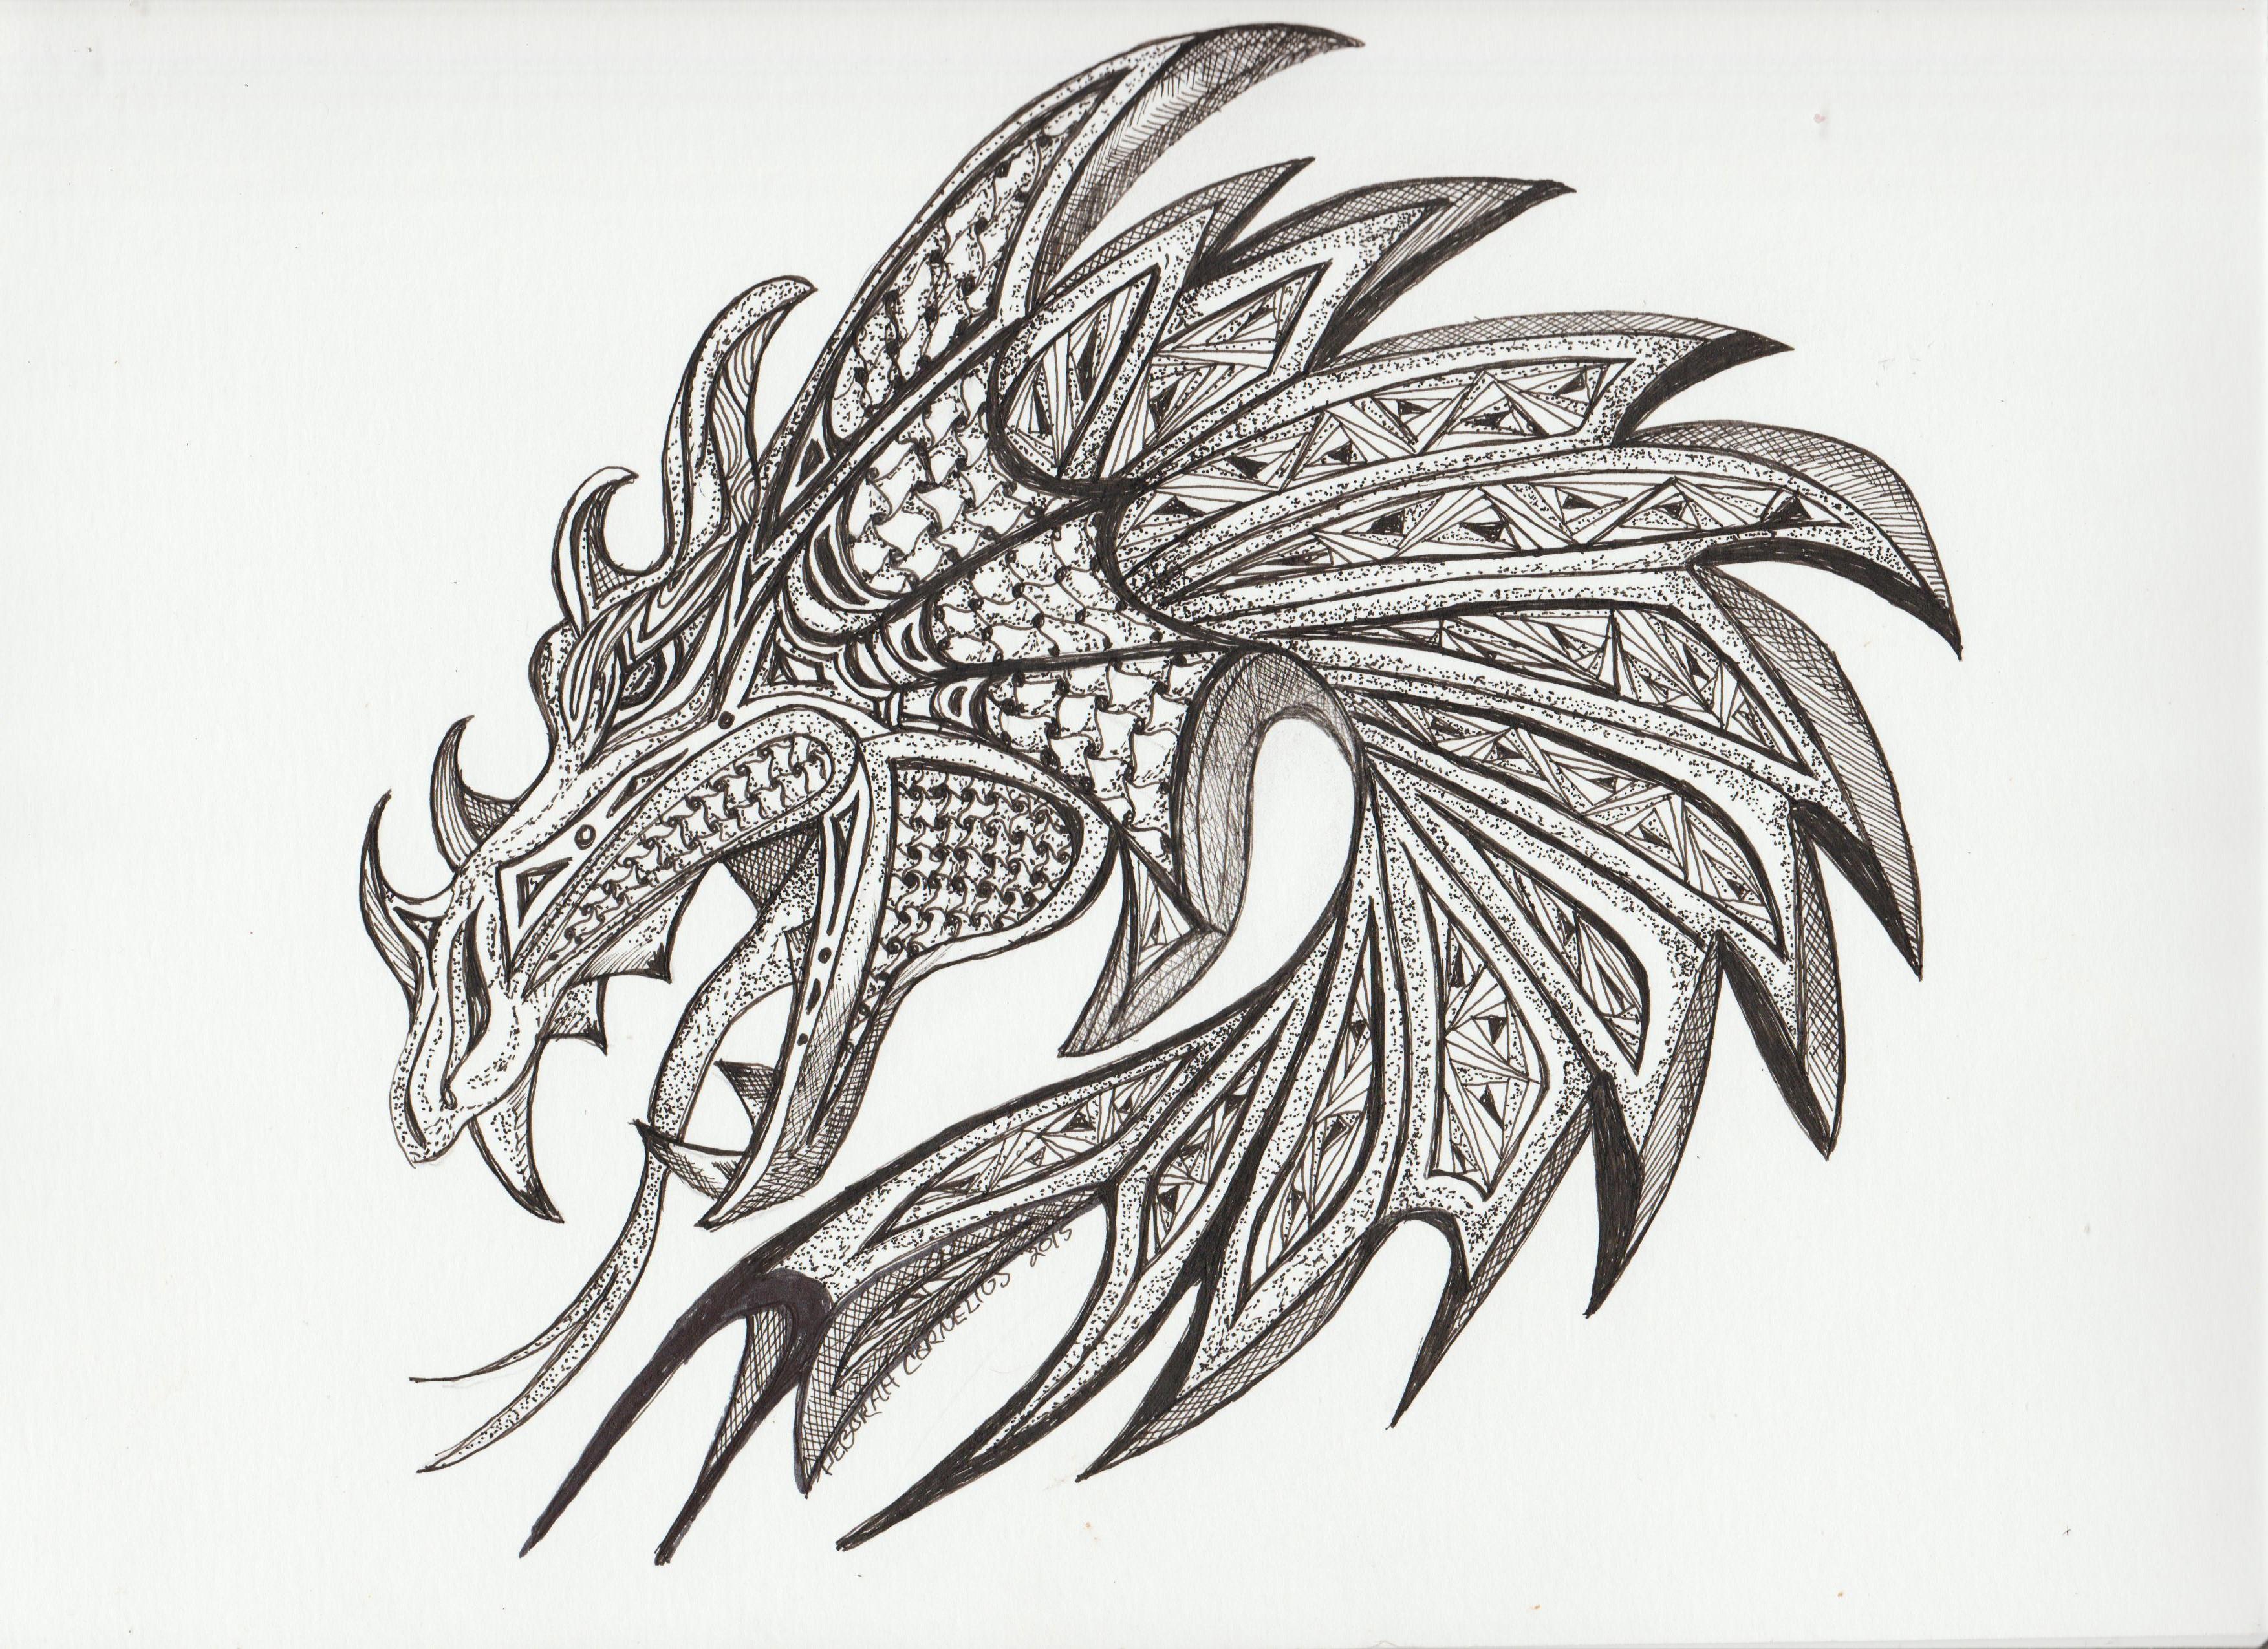 Doodle Art Animals - DayLee, page 1 | Foundmyself